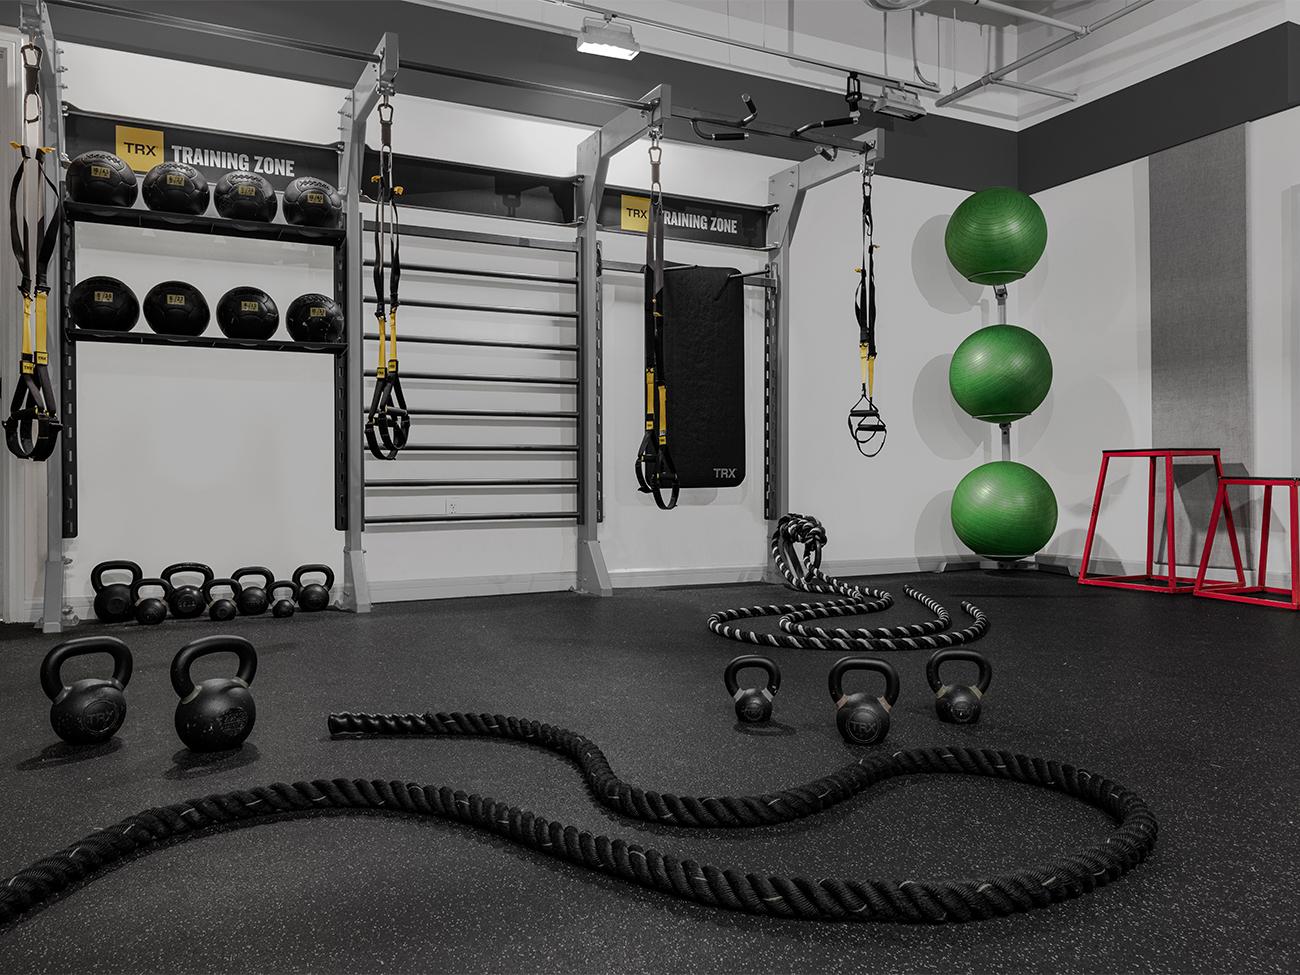 Marriott's Oceana Palms Fitness Center. Marriott's Oceana Palms is located in Riviera Beach, Florida United States.